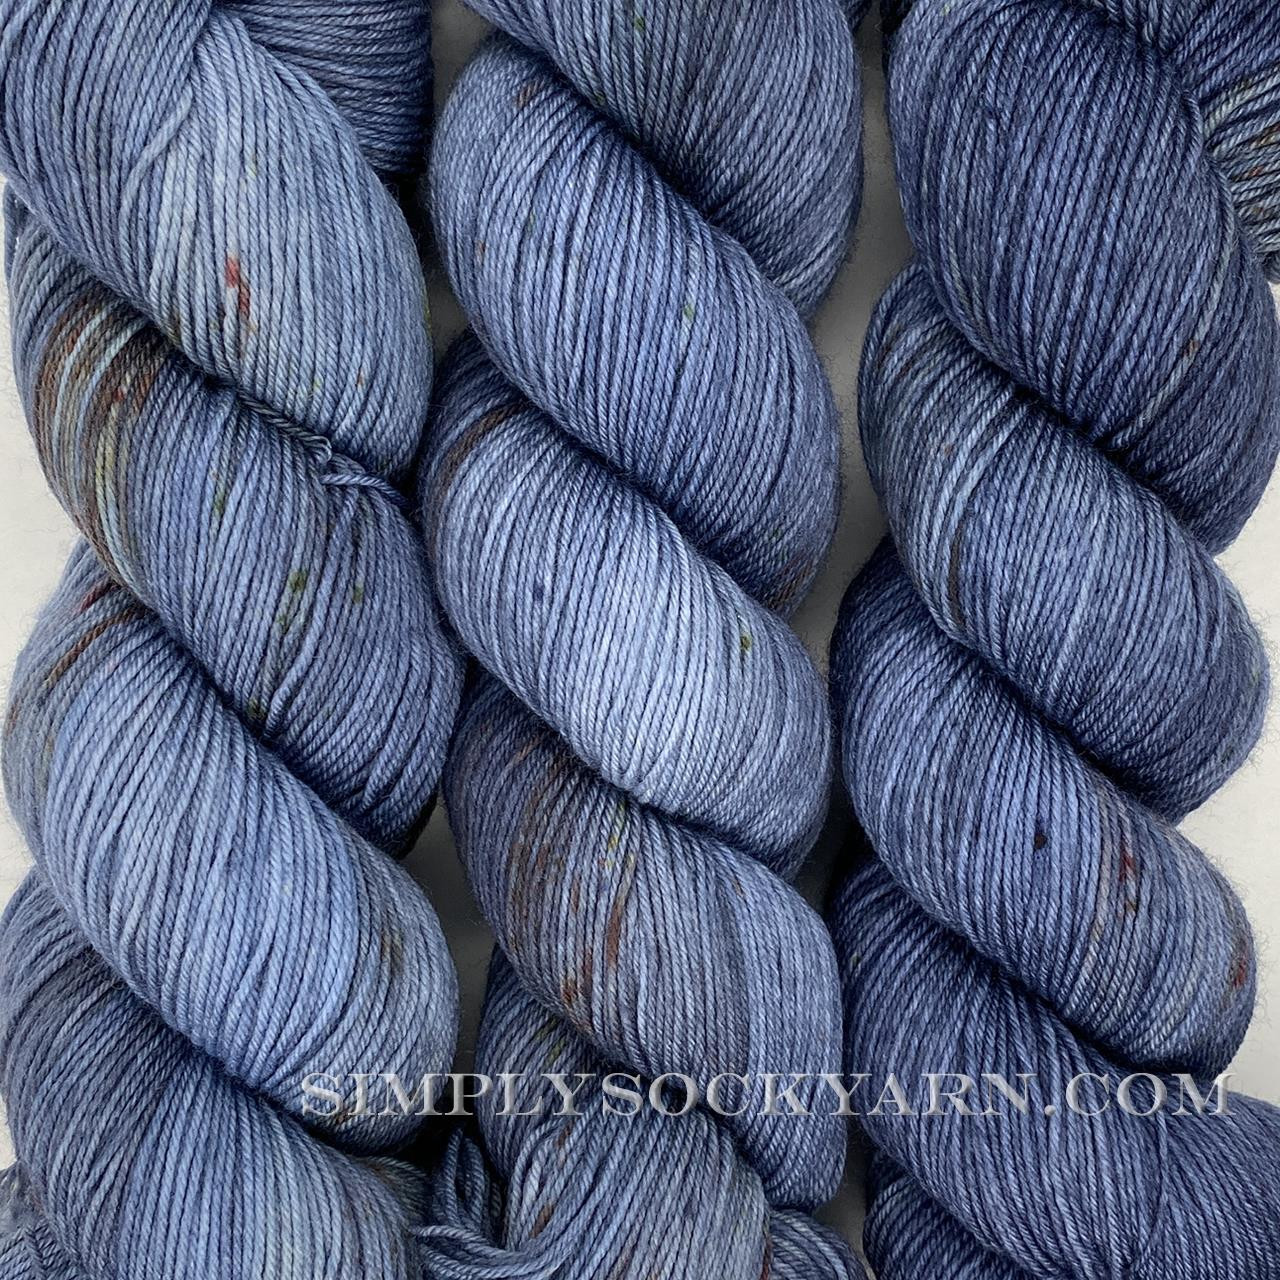 LITLG Sock Blue Silver -